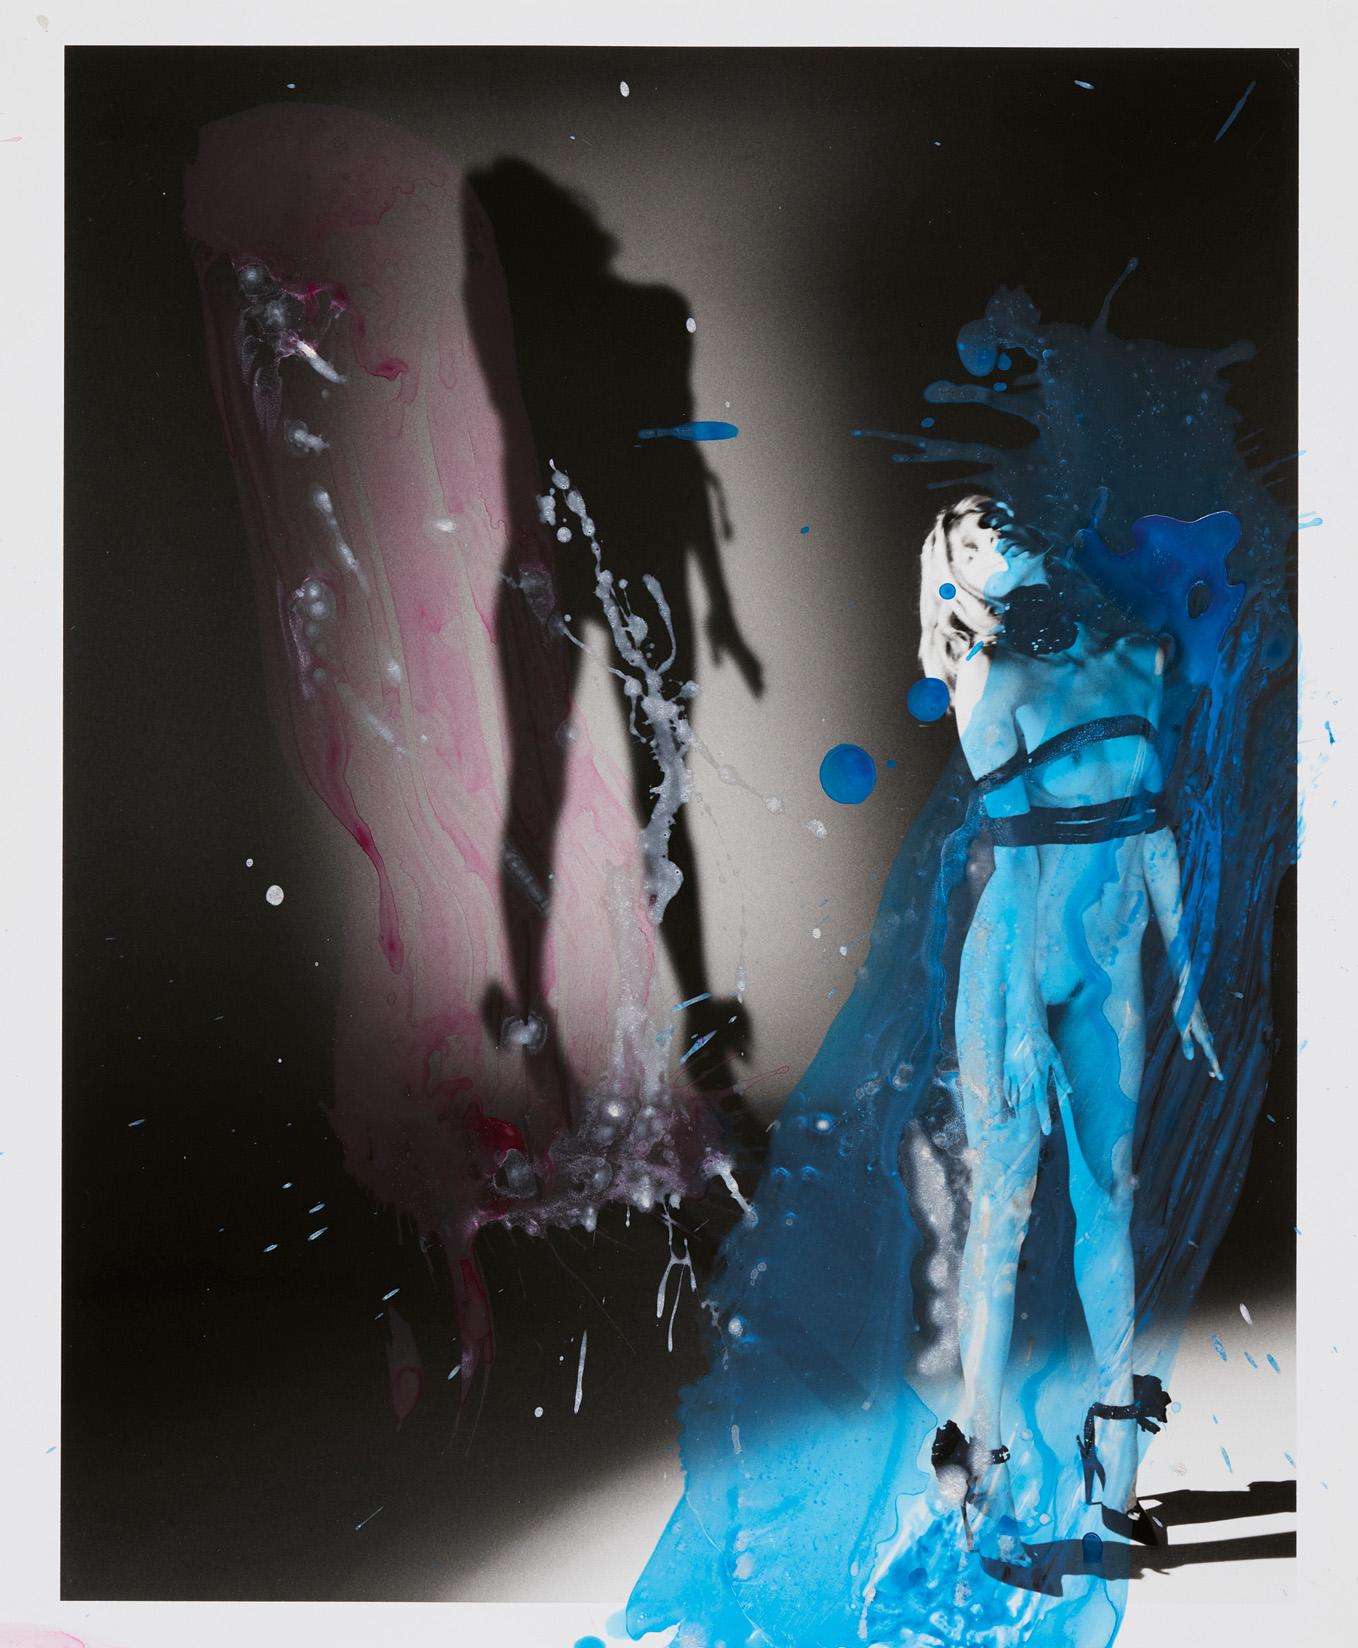 Escarpins, SAINT LAURENT PAR ANTHONY VACCARELLO. Nobuyoshi Araki/Courtesy of Saint Laurent and Taka Ishii Gallery.